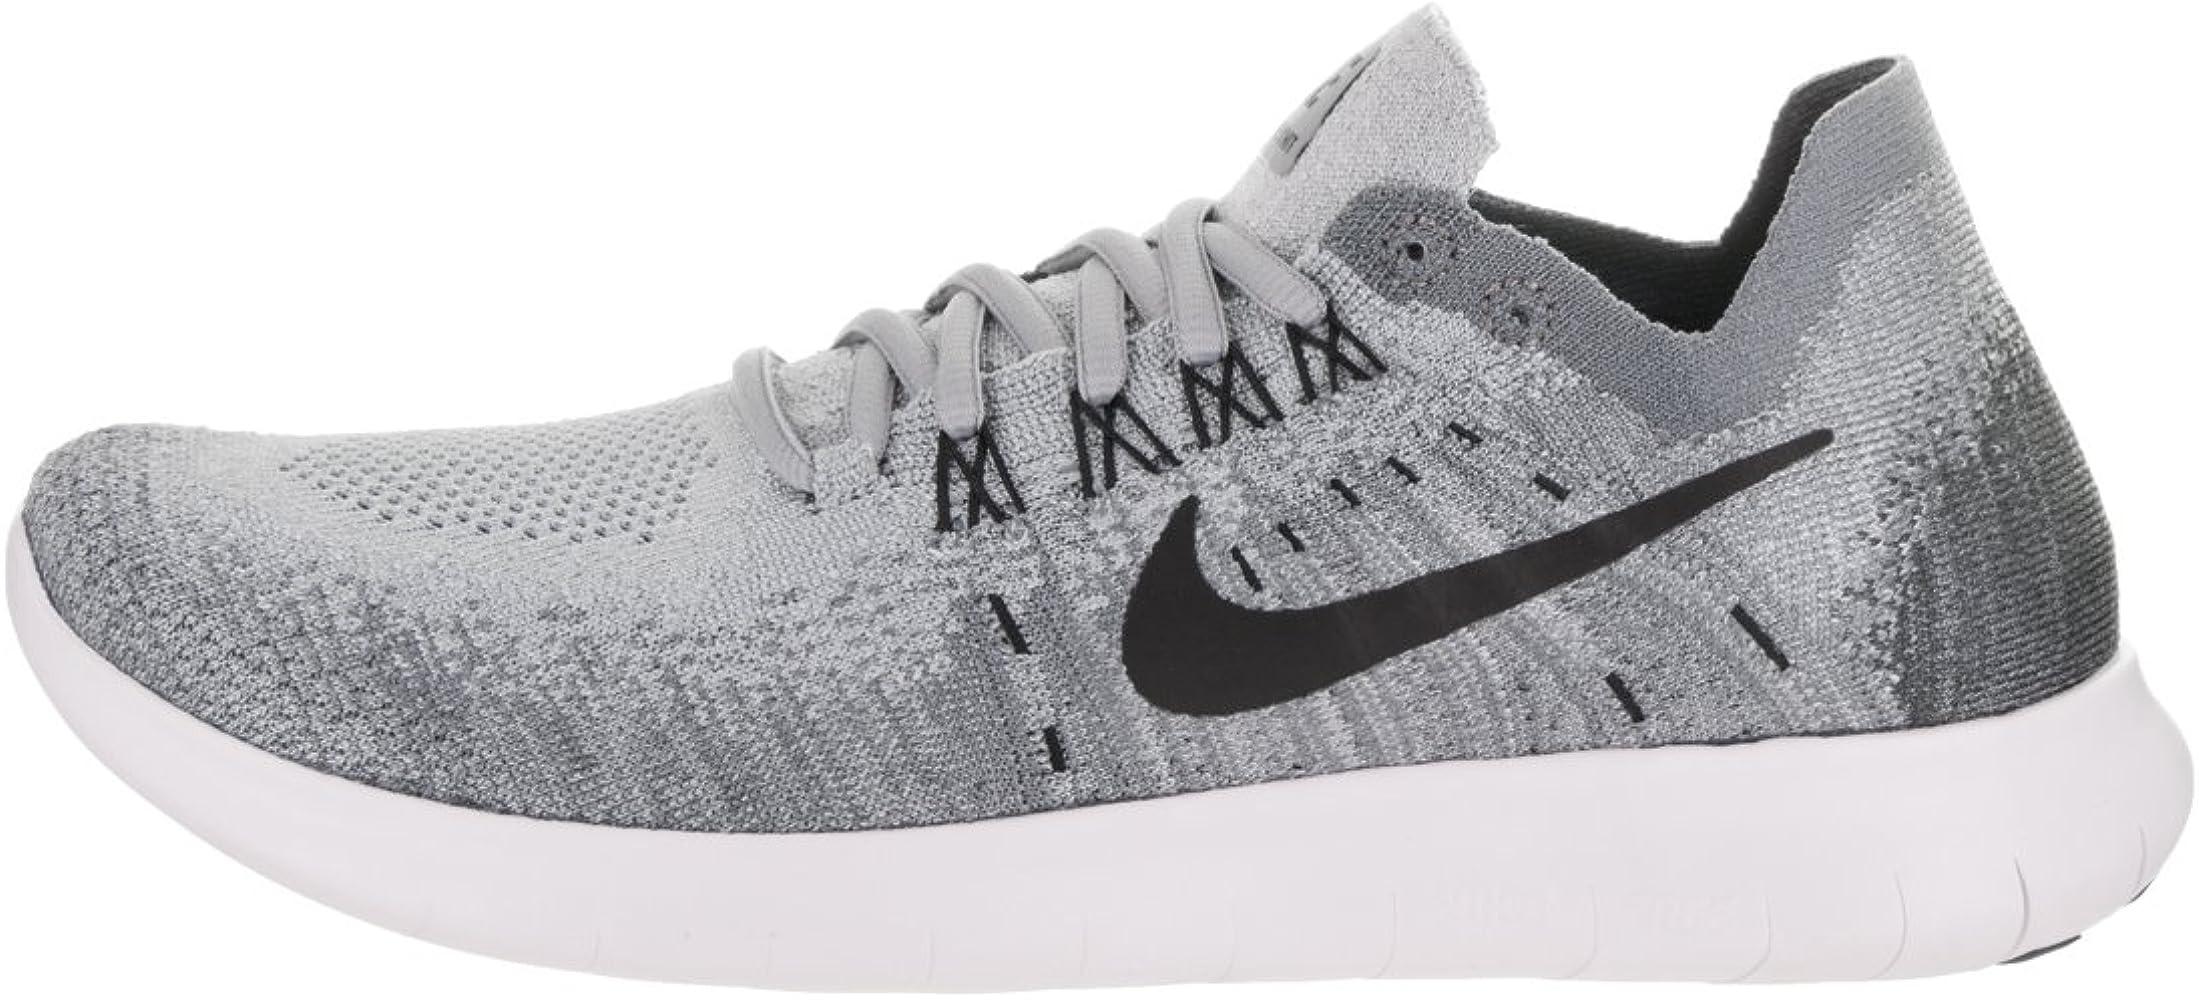 Nike Free Rn Flyknit 2017 Womens Running Shoes 10 B M Us Road Running